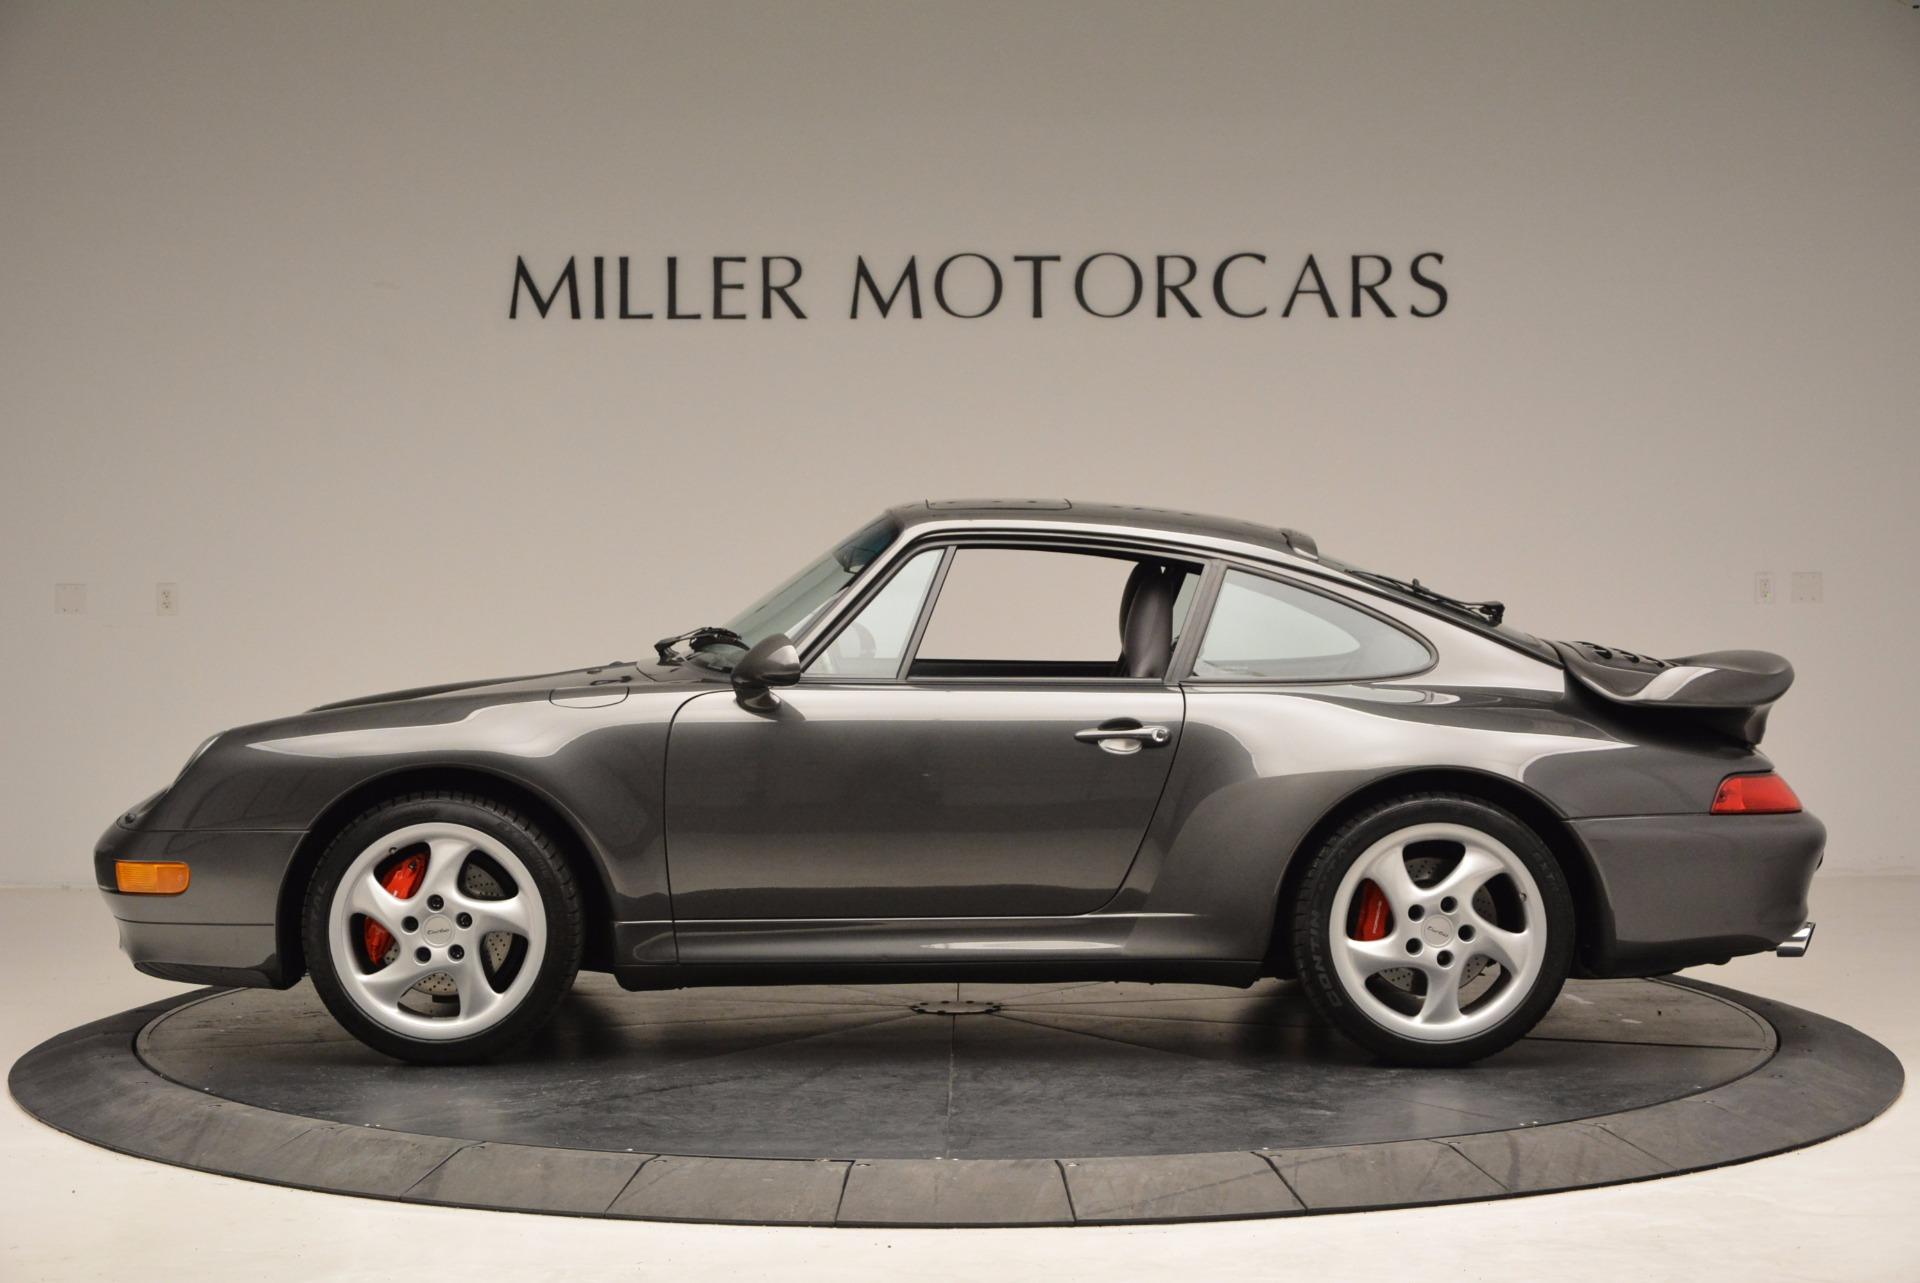 Used 1996 Porsche 911 Turbo For Sale In Greenwich, CT 1058_p3